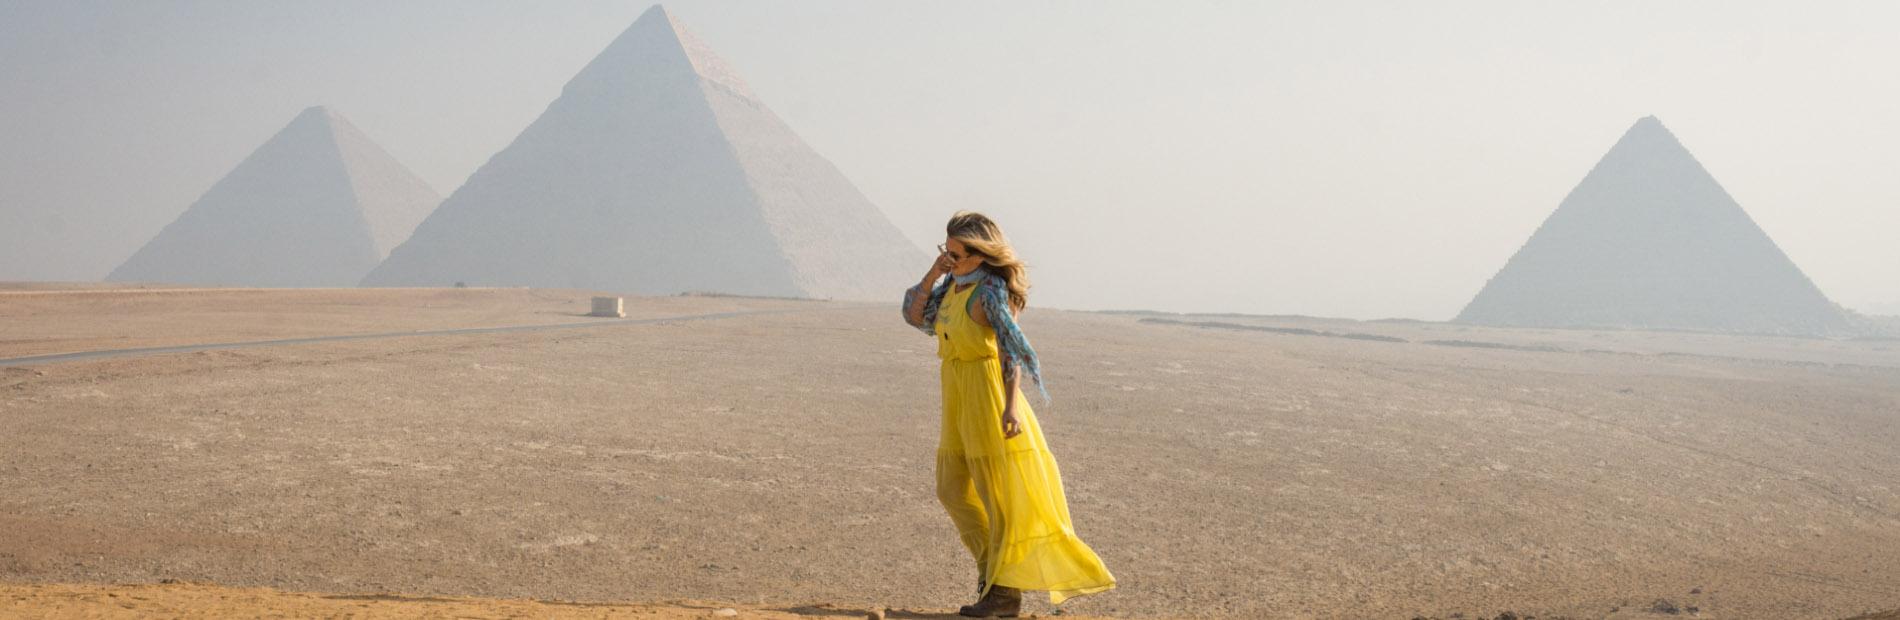 Egyptair Flights From United Kingdom Cheap Flights